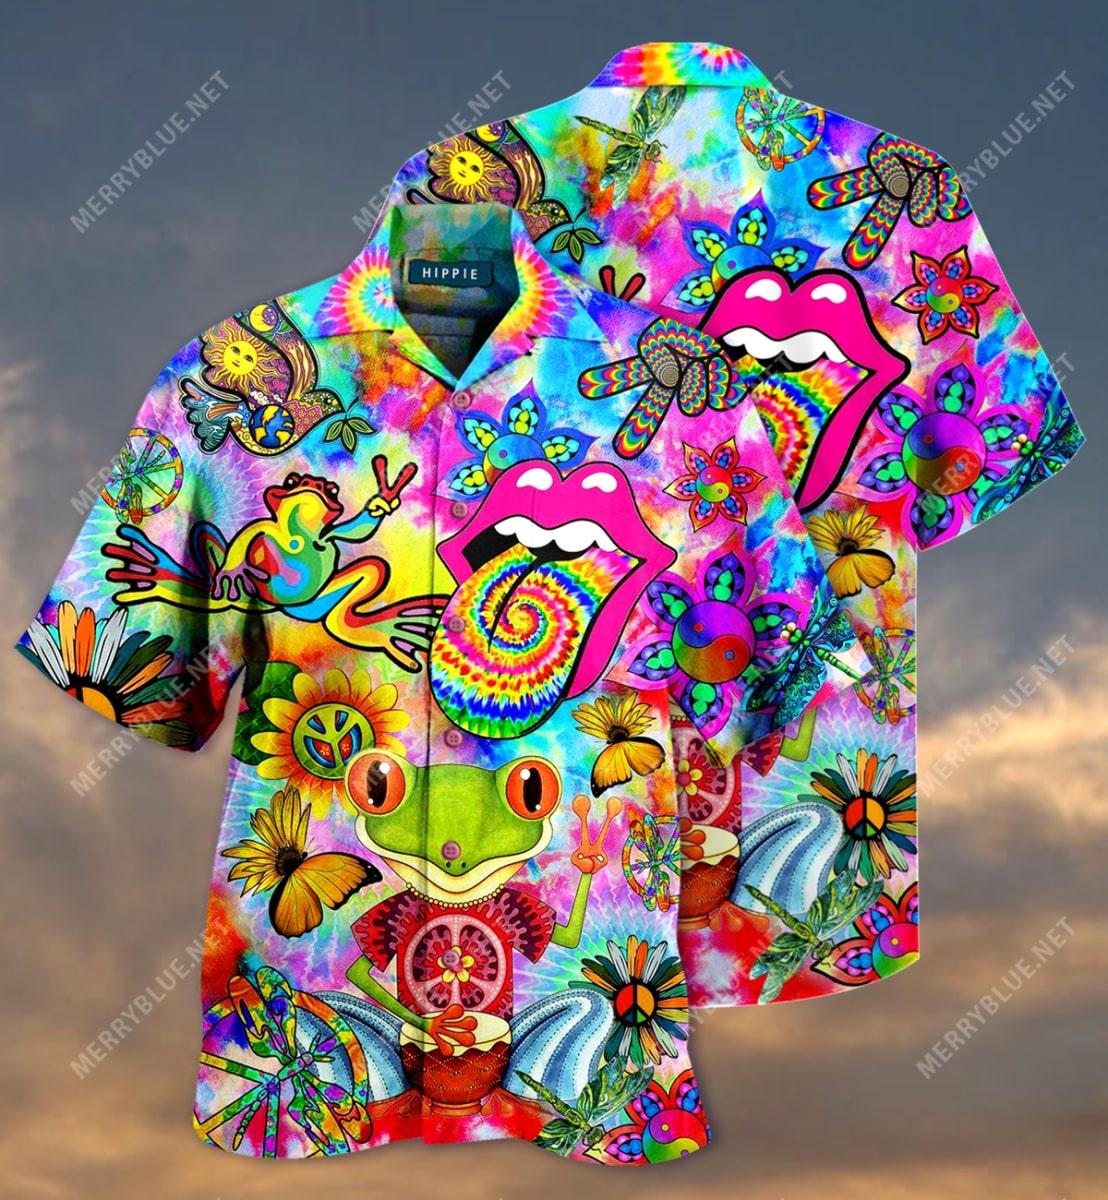 hippie feeling groovy colorful all over printed hawaiian shirt 3